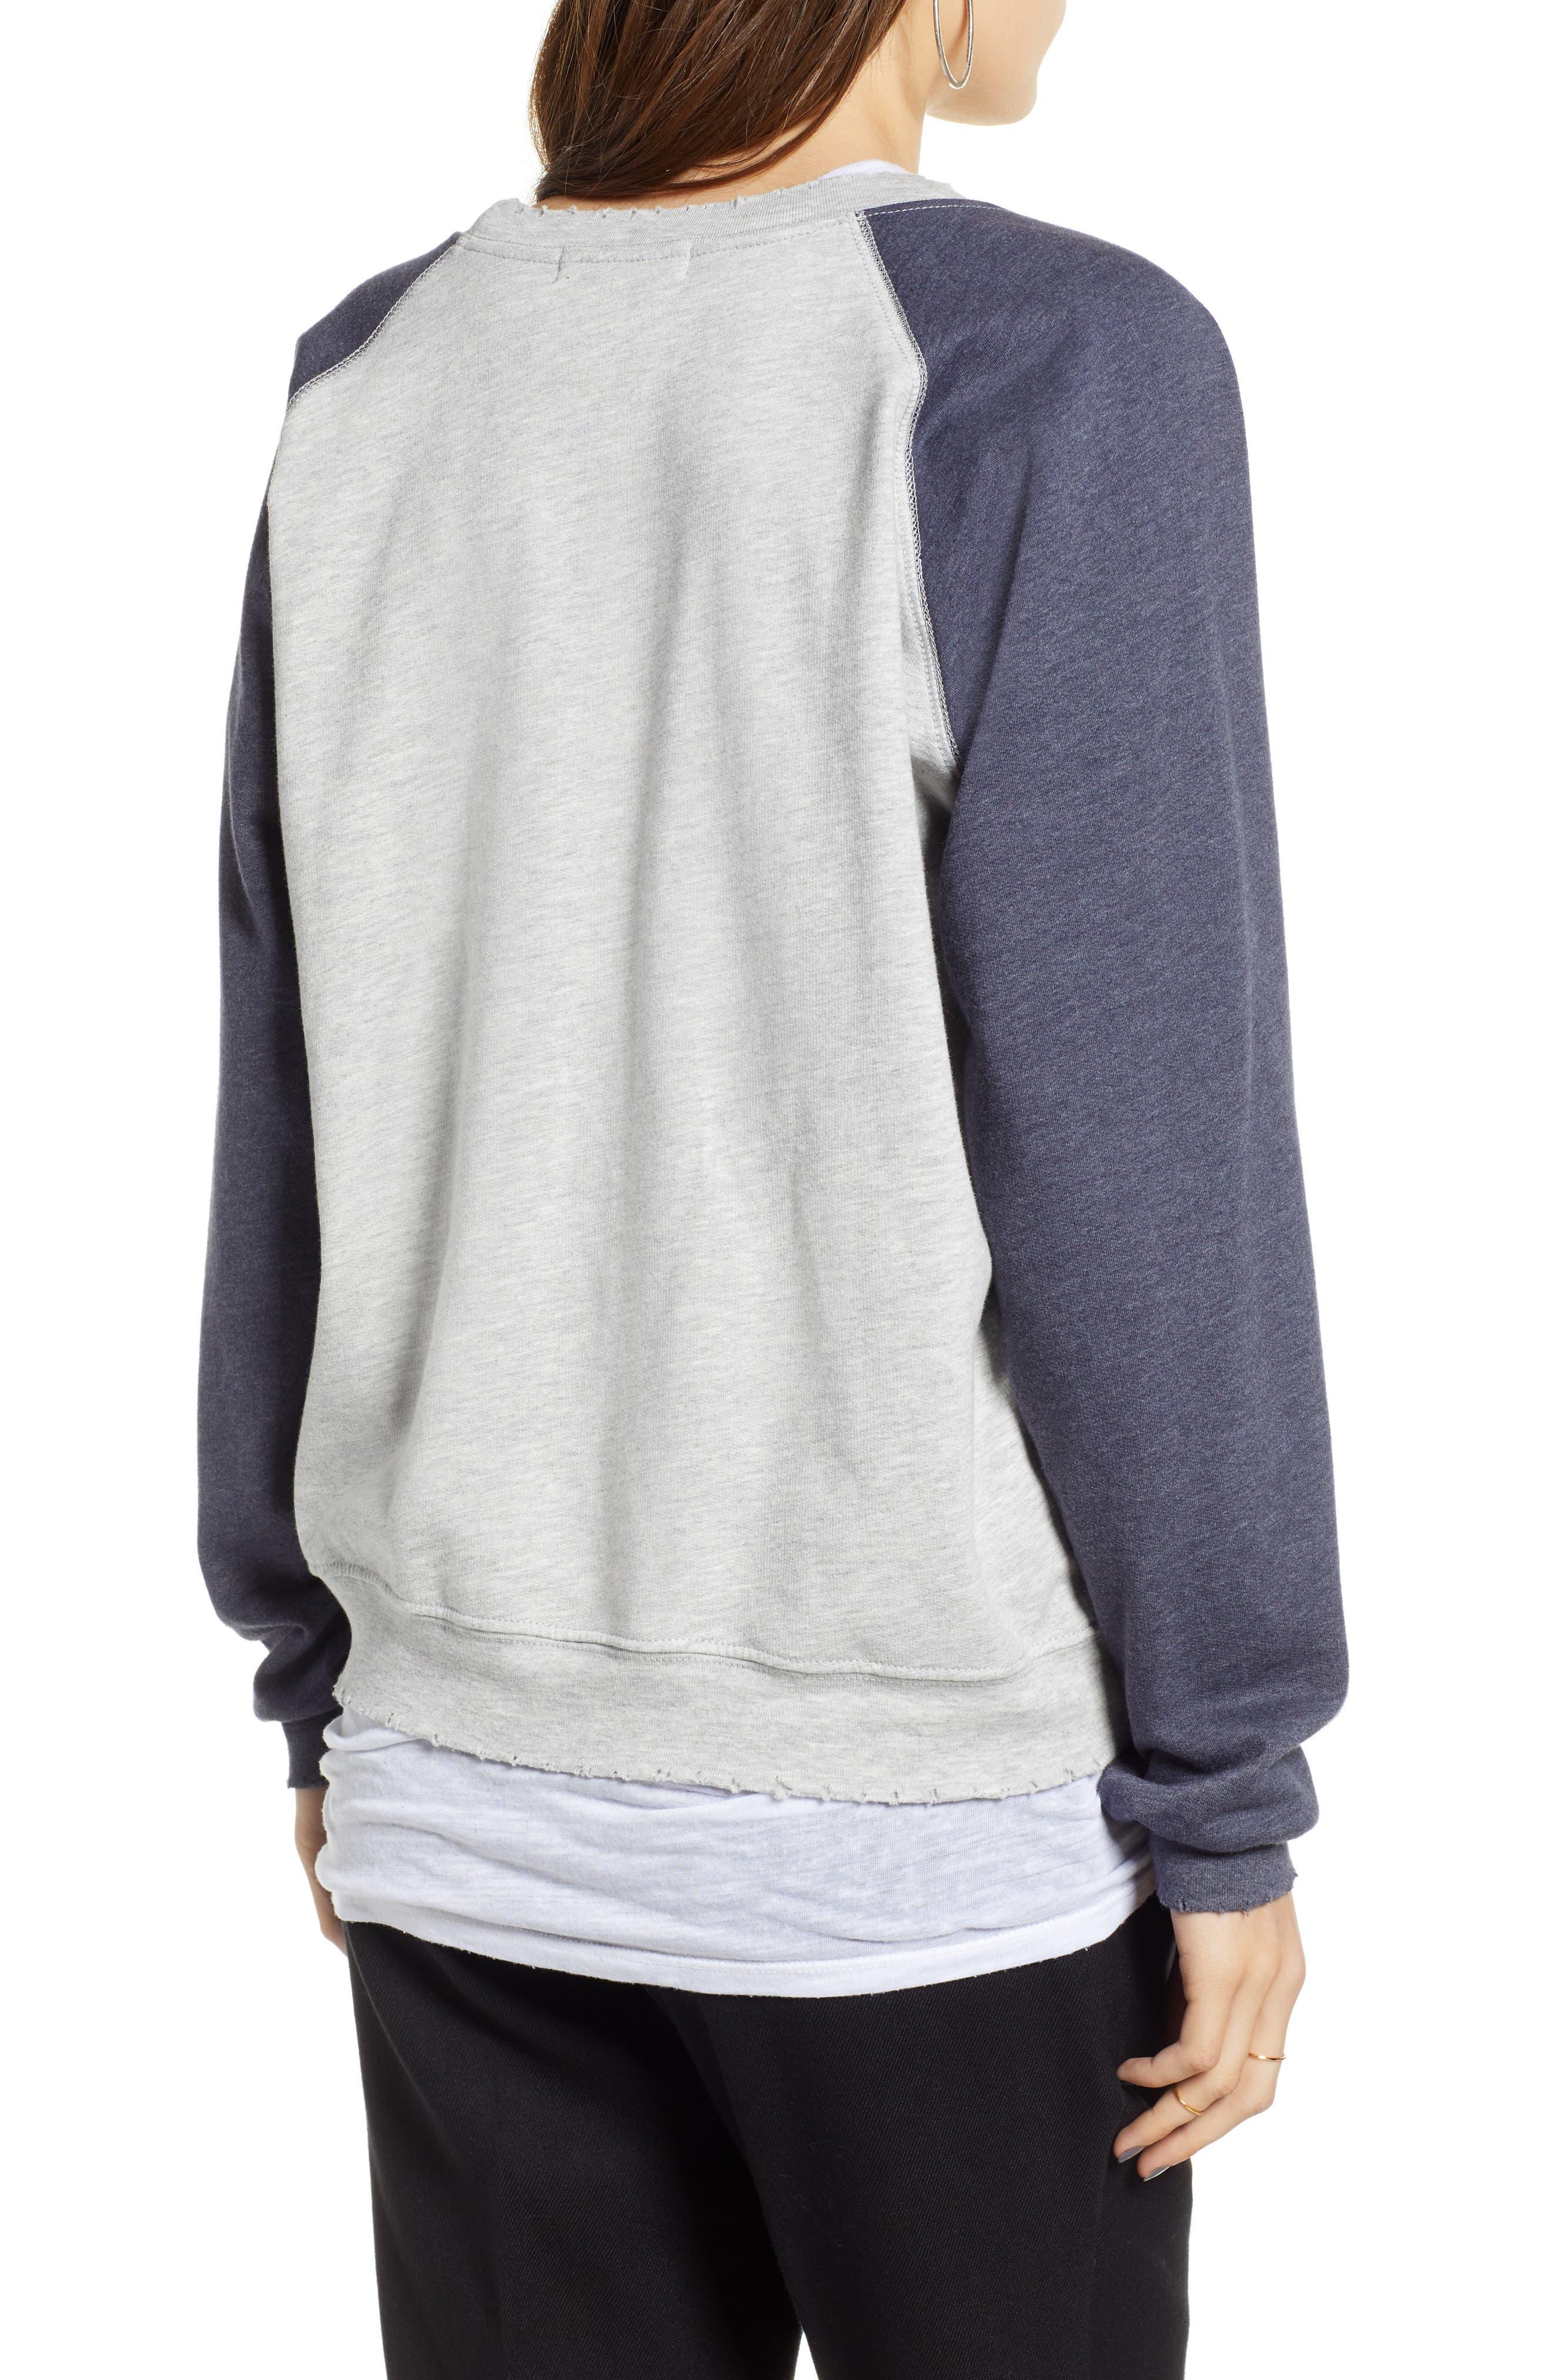 Raglan Sweatshirt,                             Alternate thumbnail 2, color,                             GREY HEATHER- NAVY COMBO